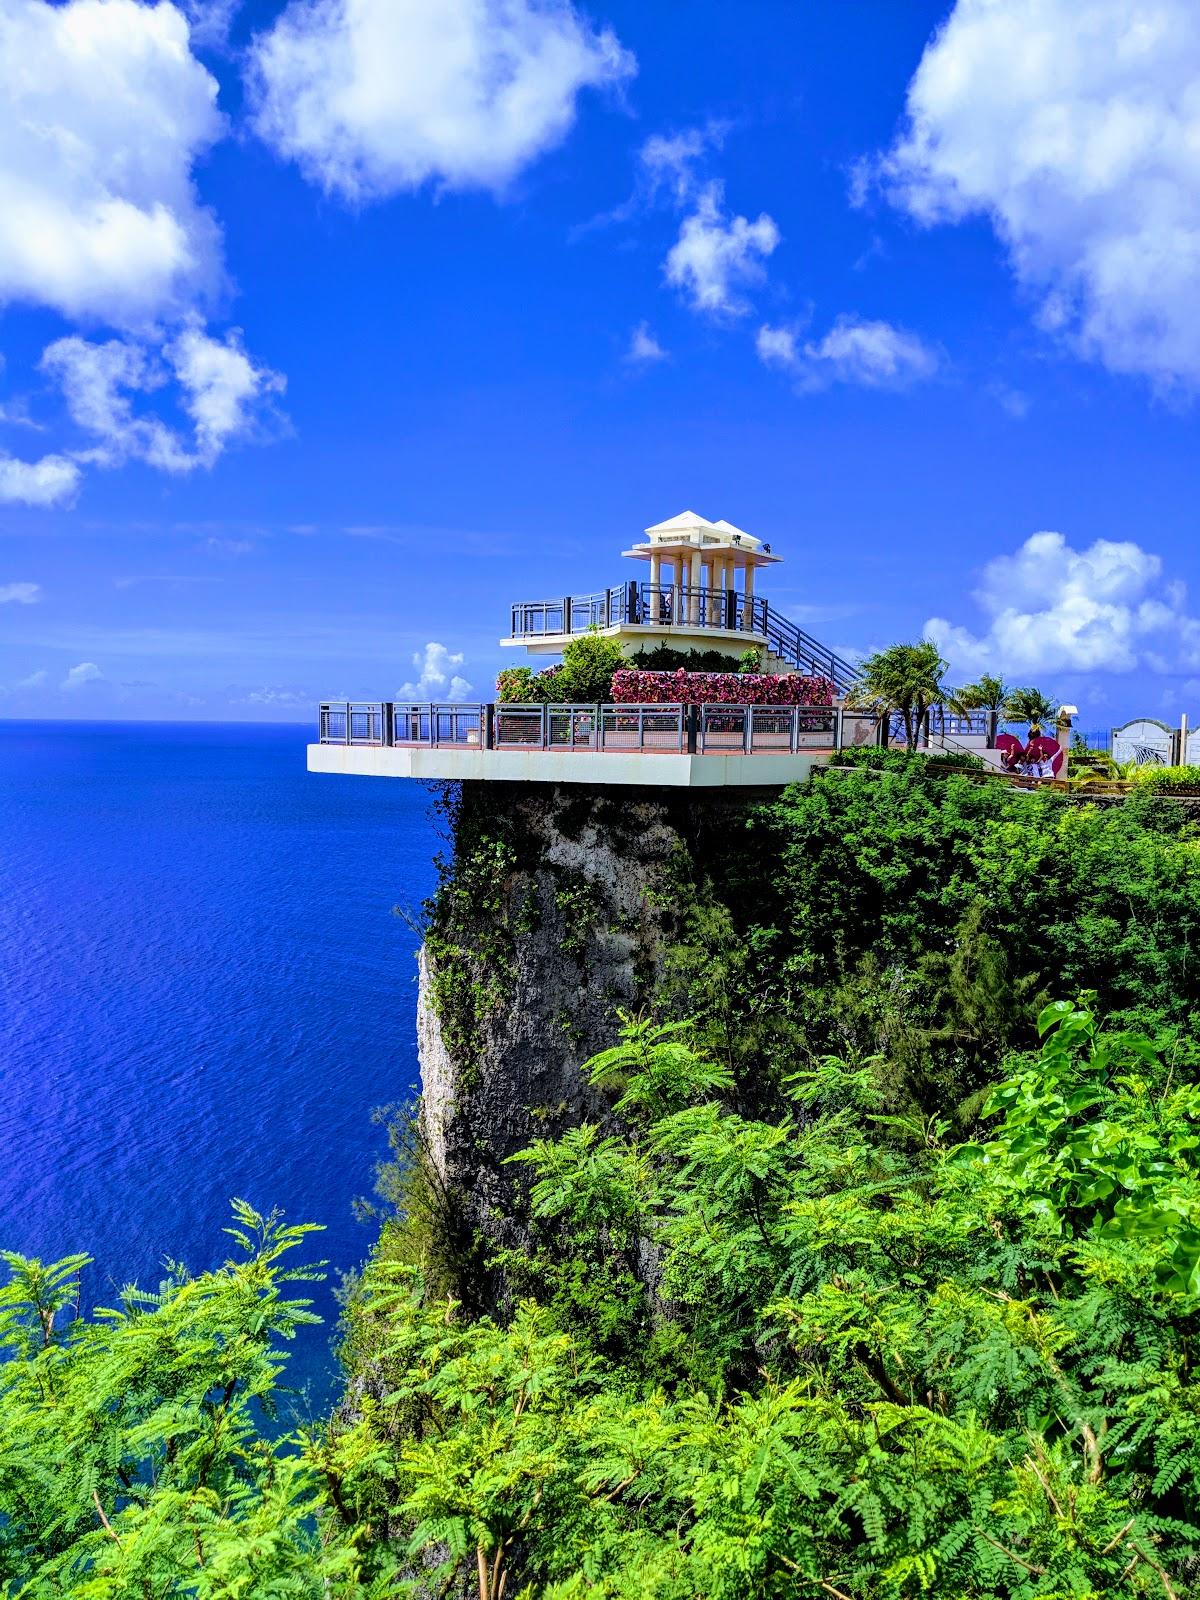 Vacation Home Rentals in Guam